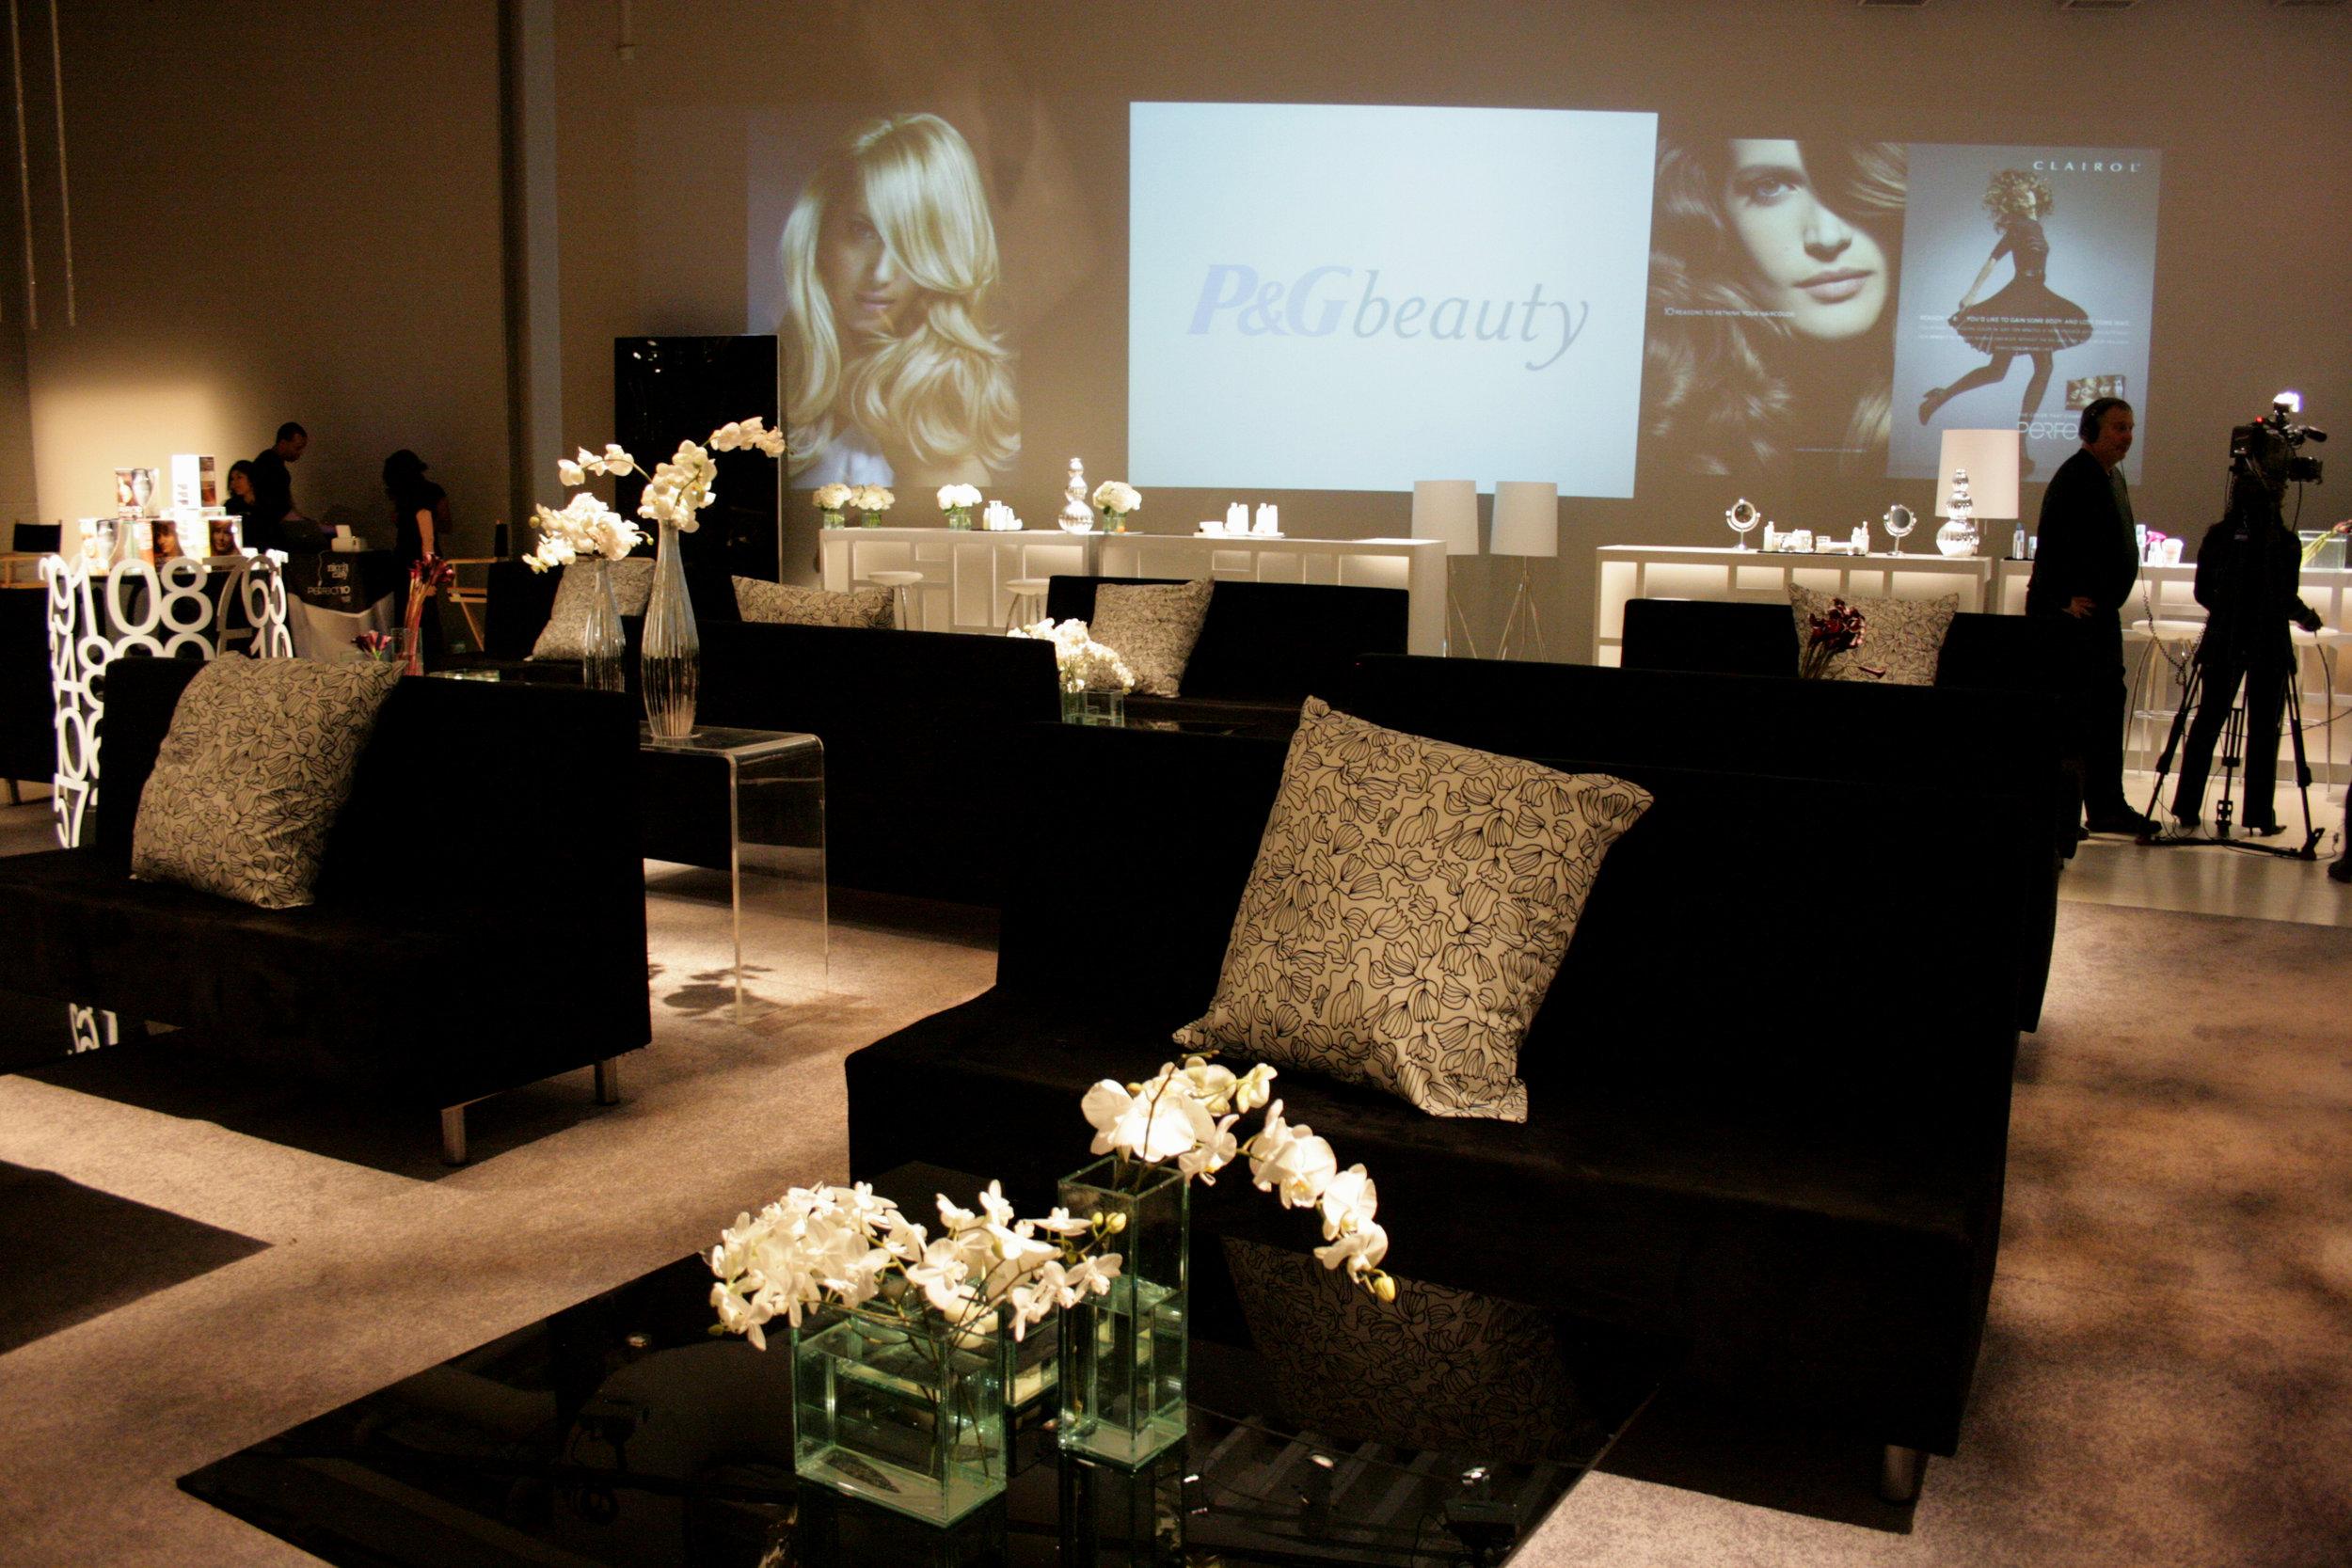 Beauty Event Decor